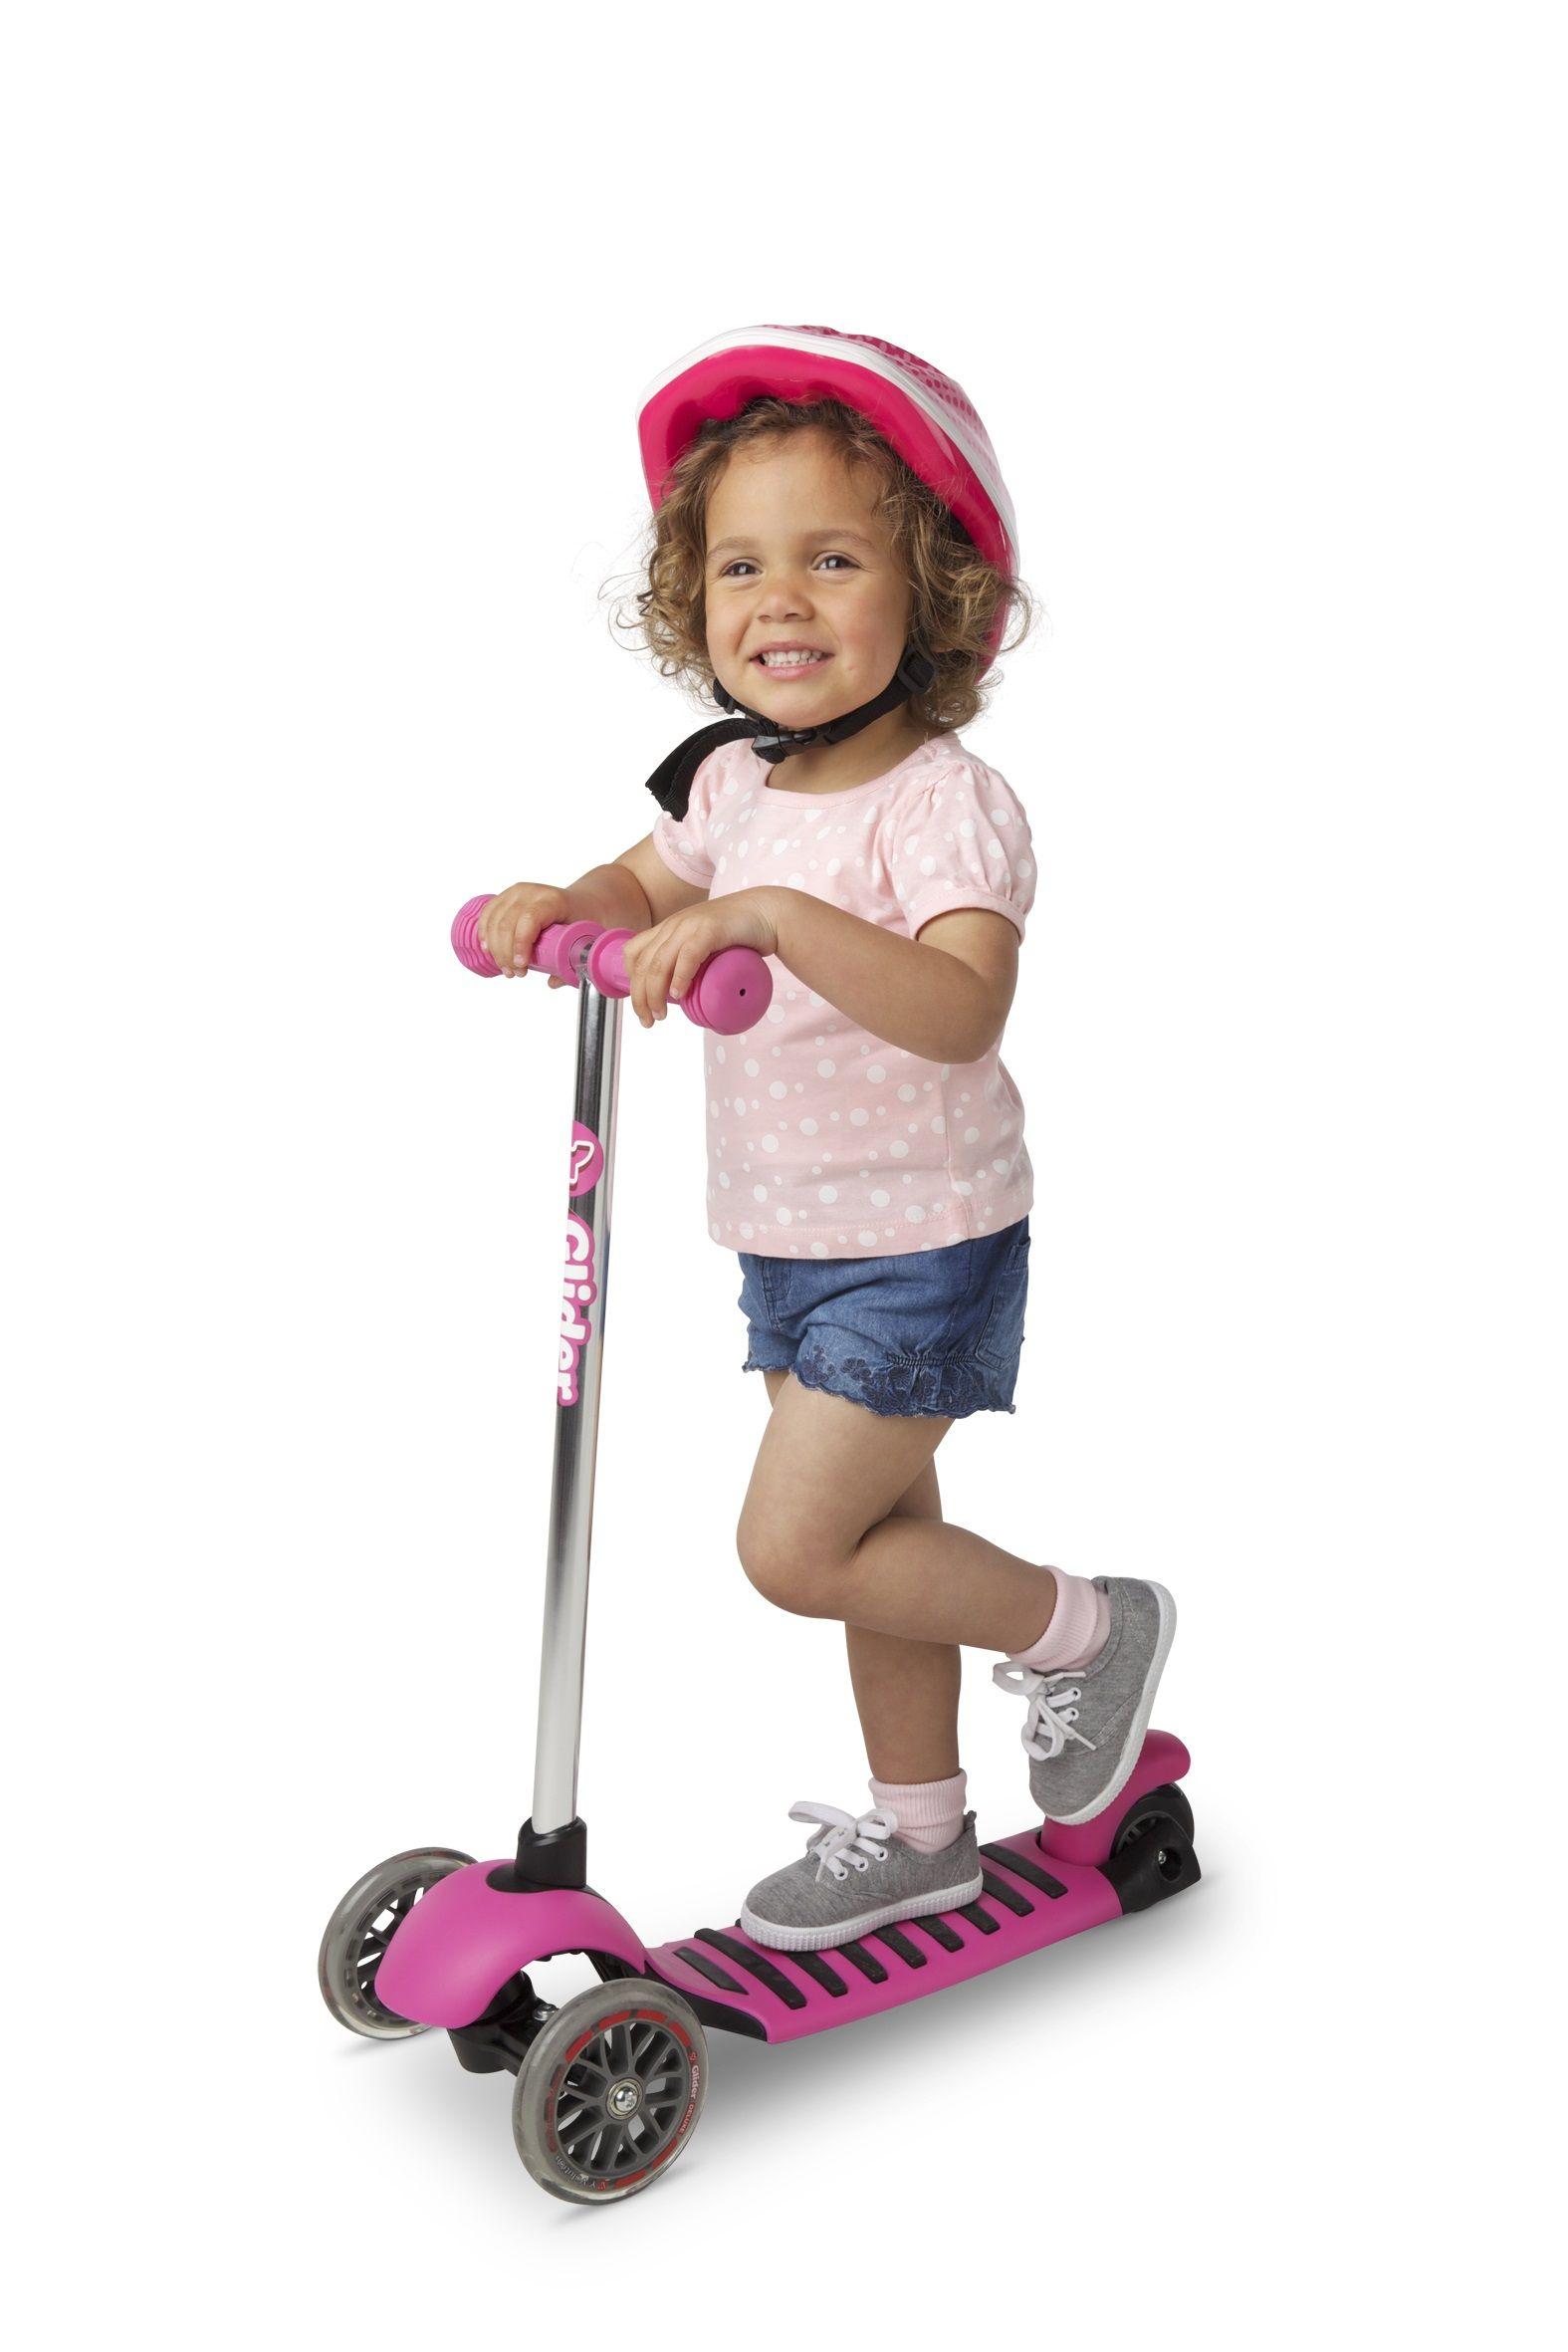 Y Glider 3 Wheel Scooter Kids Scooter Y Glider Deluxe Pink